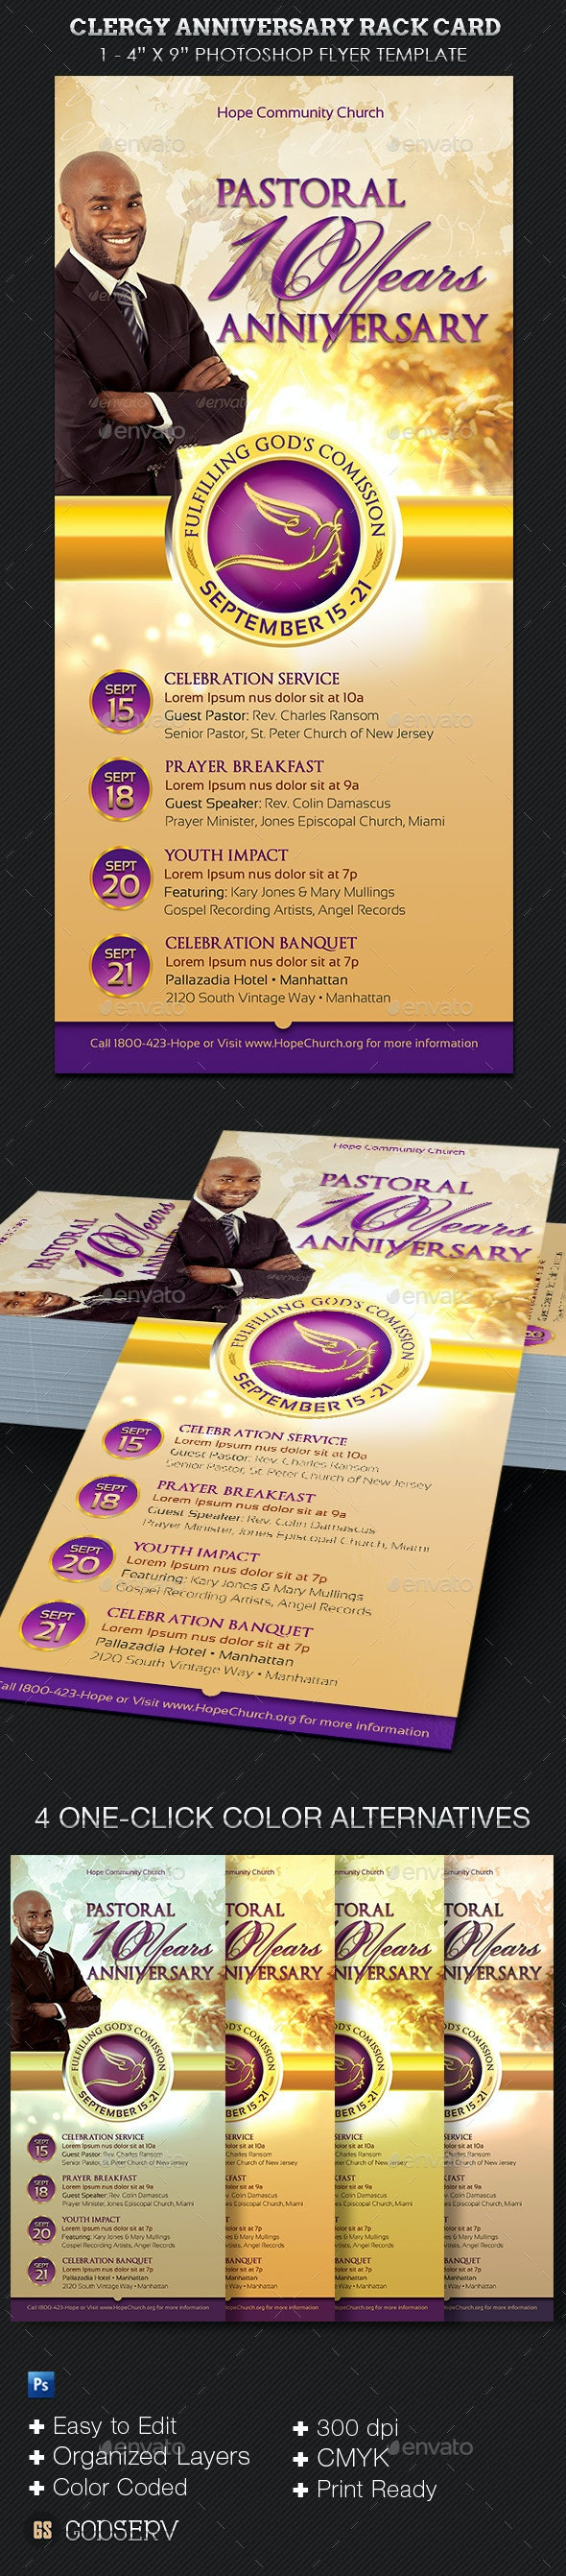 Clergy Anniversary Rack Card Template - Church Flyers